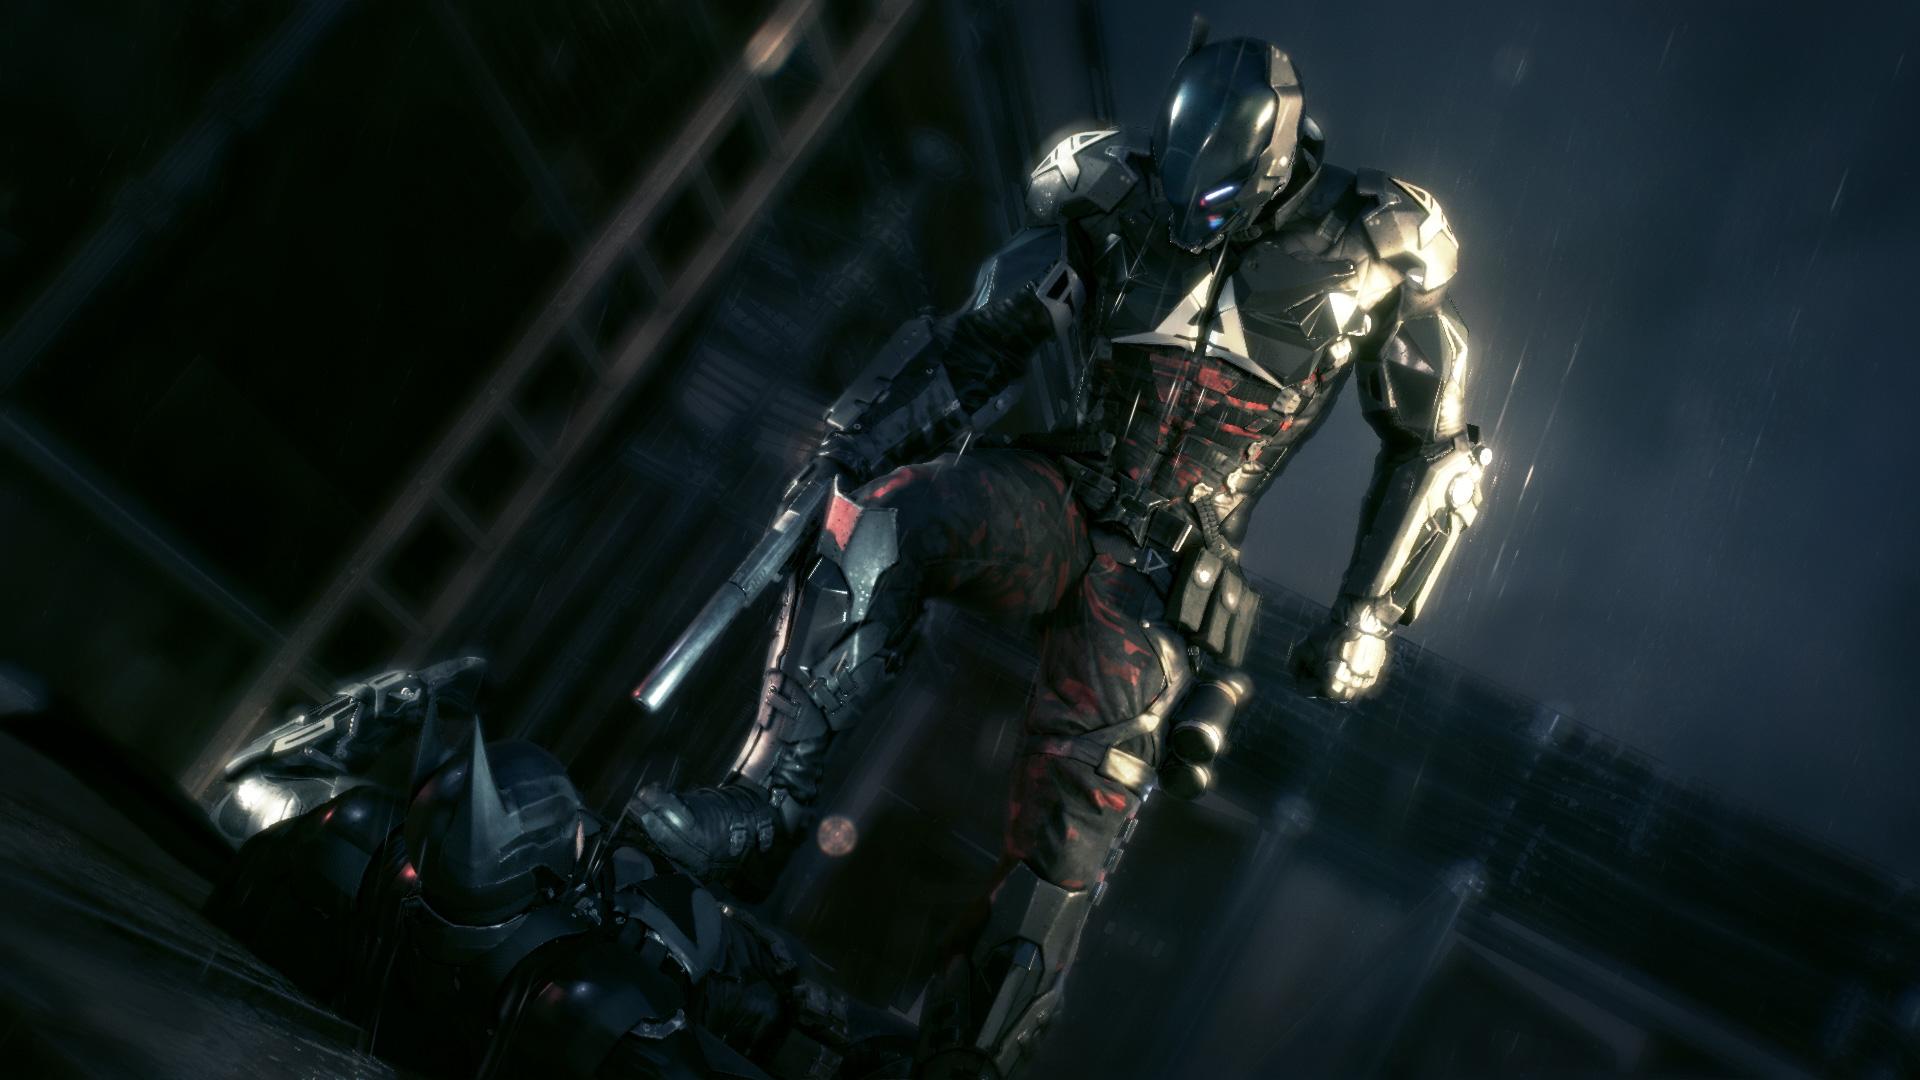 The Arkham Knight lording it over Batman.